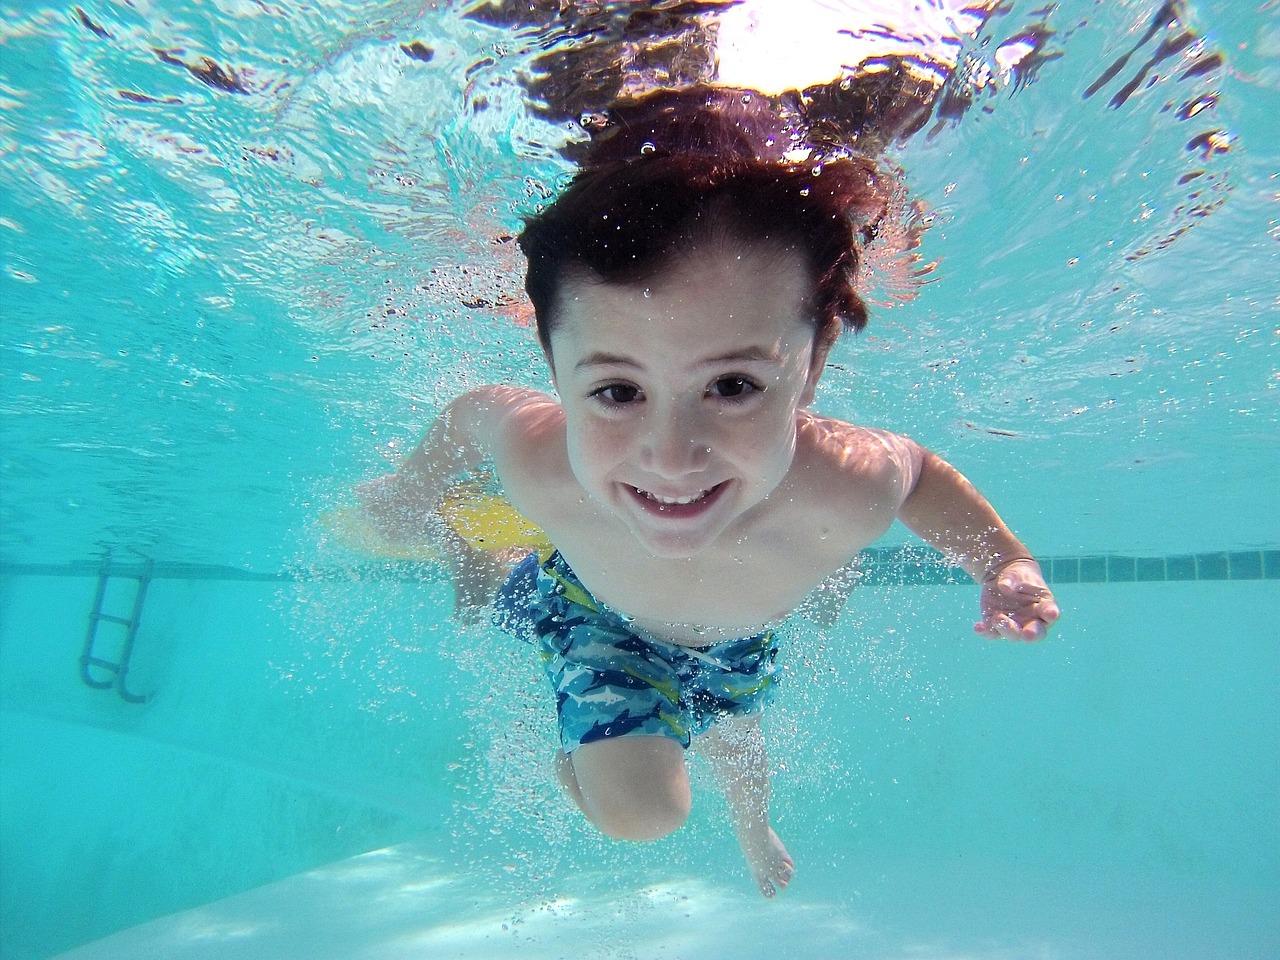 Just keep swimming! Just keep swimming!